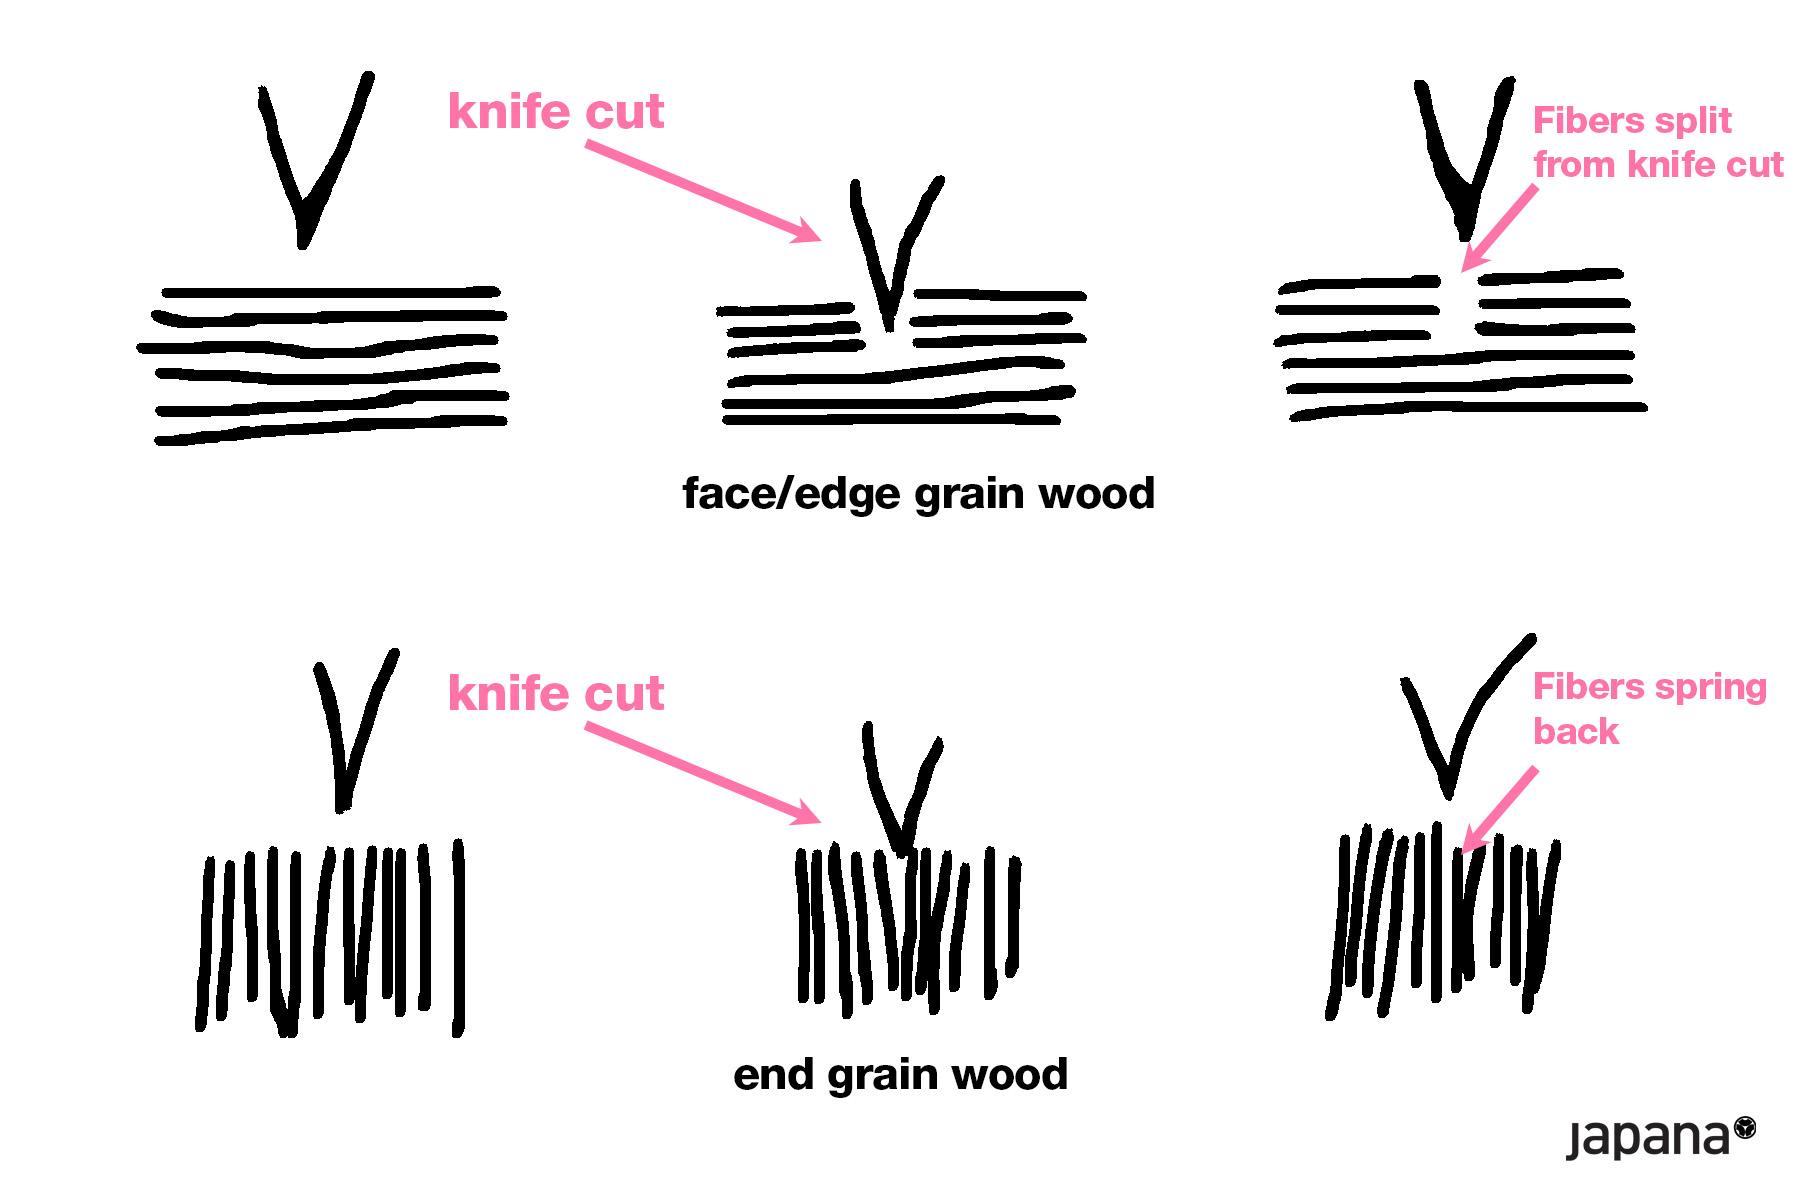 edge grain end grain board